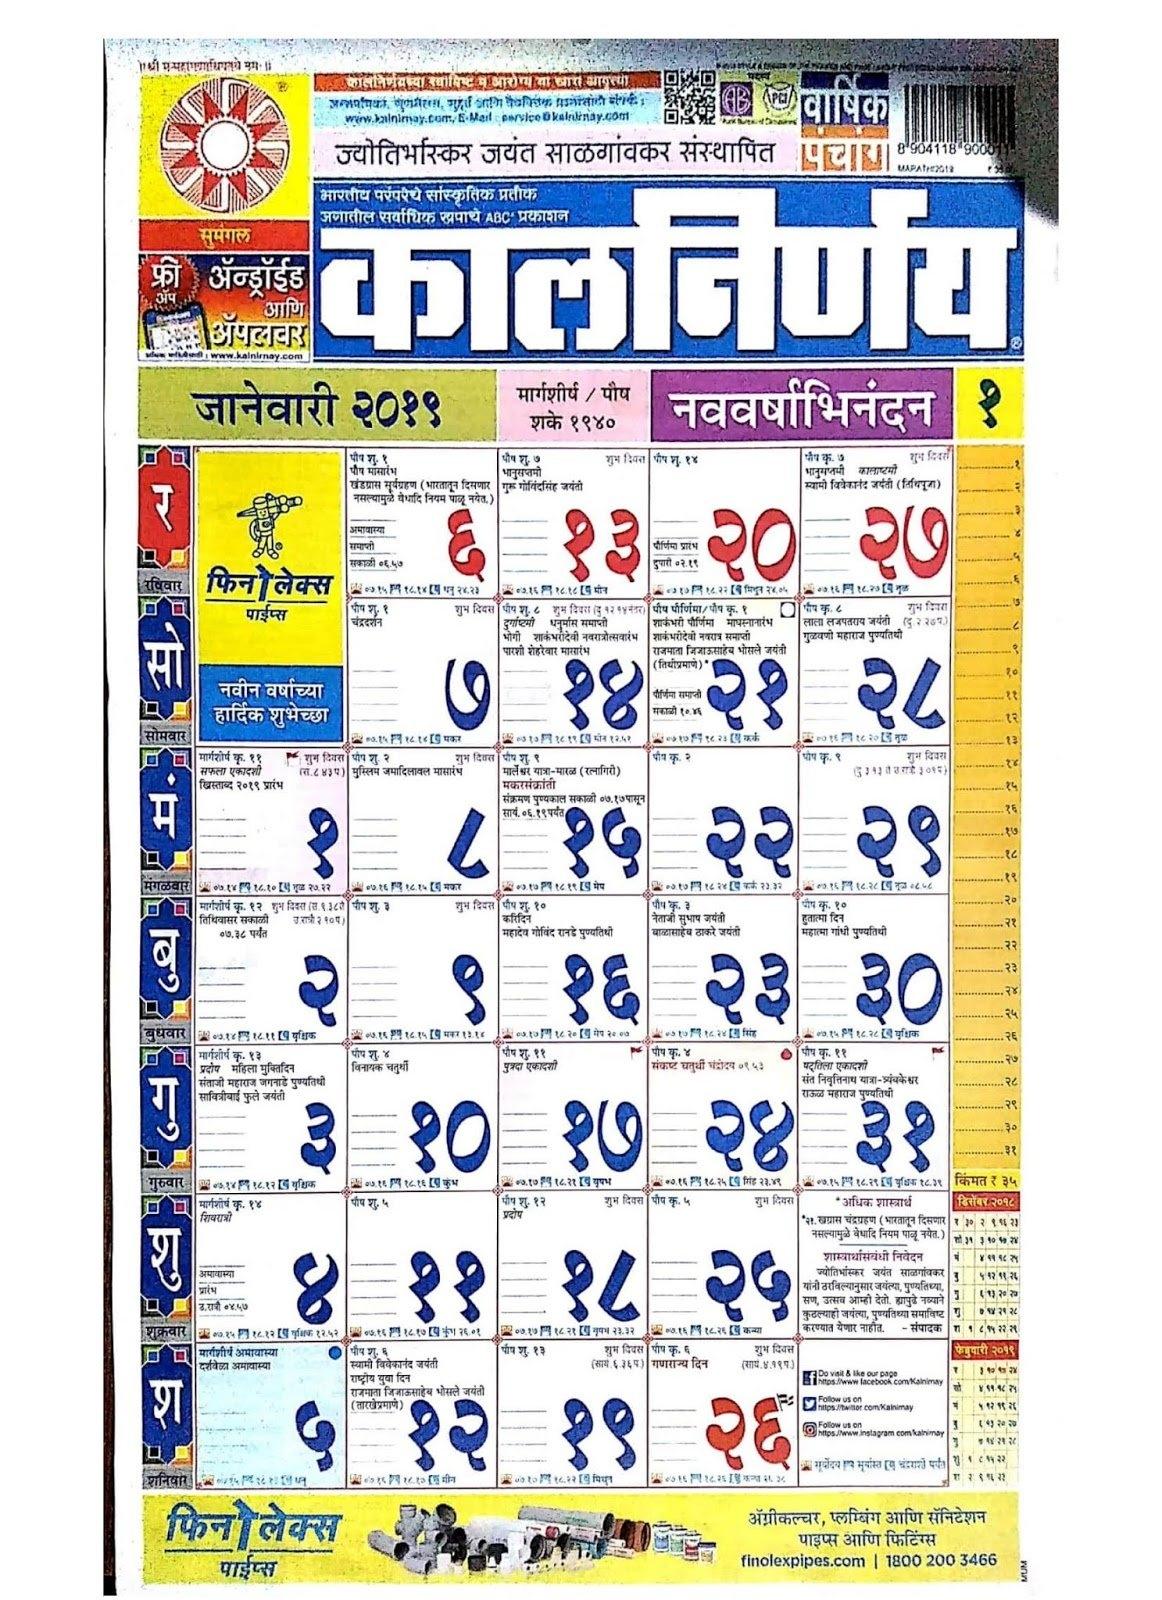 Kultejas!: मराठी कालनिर्णय कॅलेंडर २०१९ Calendar Of 2019 In Marathi